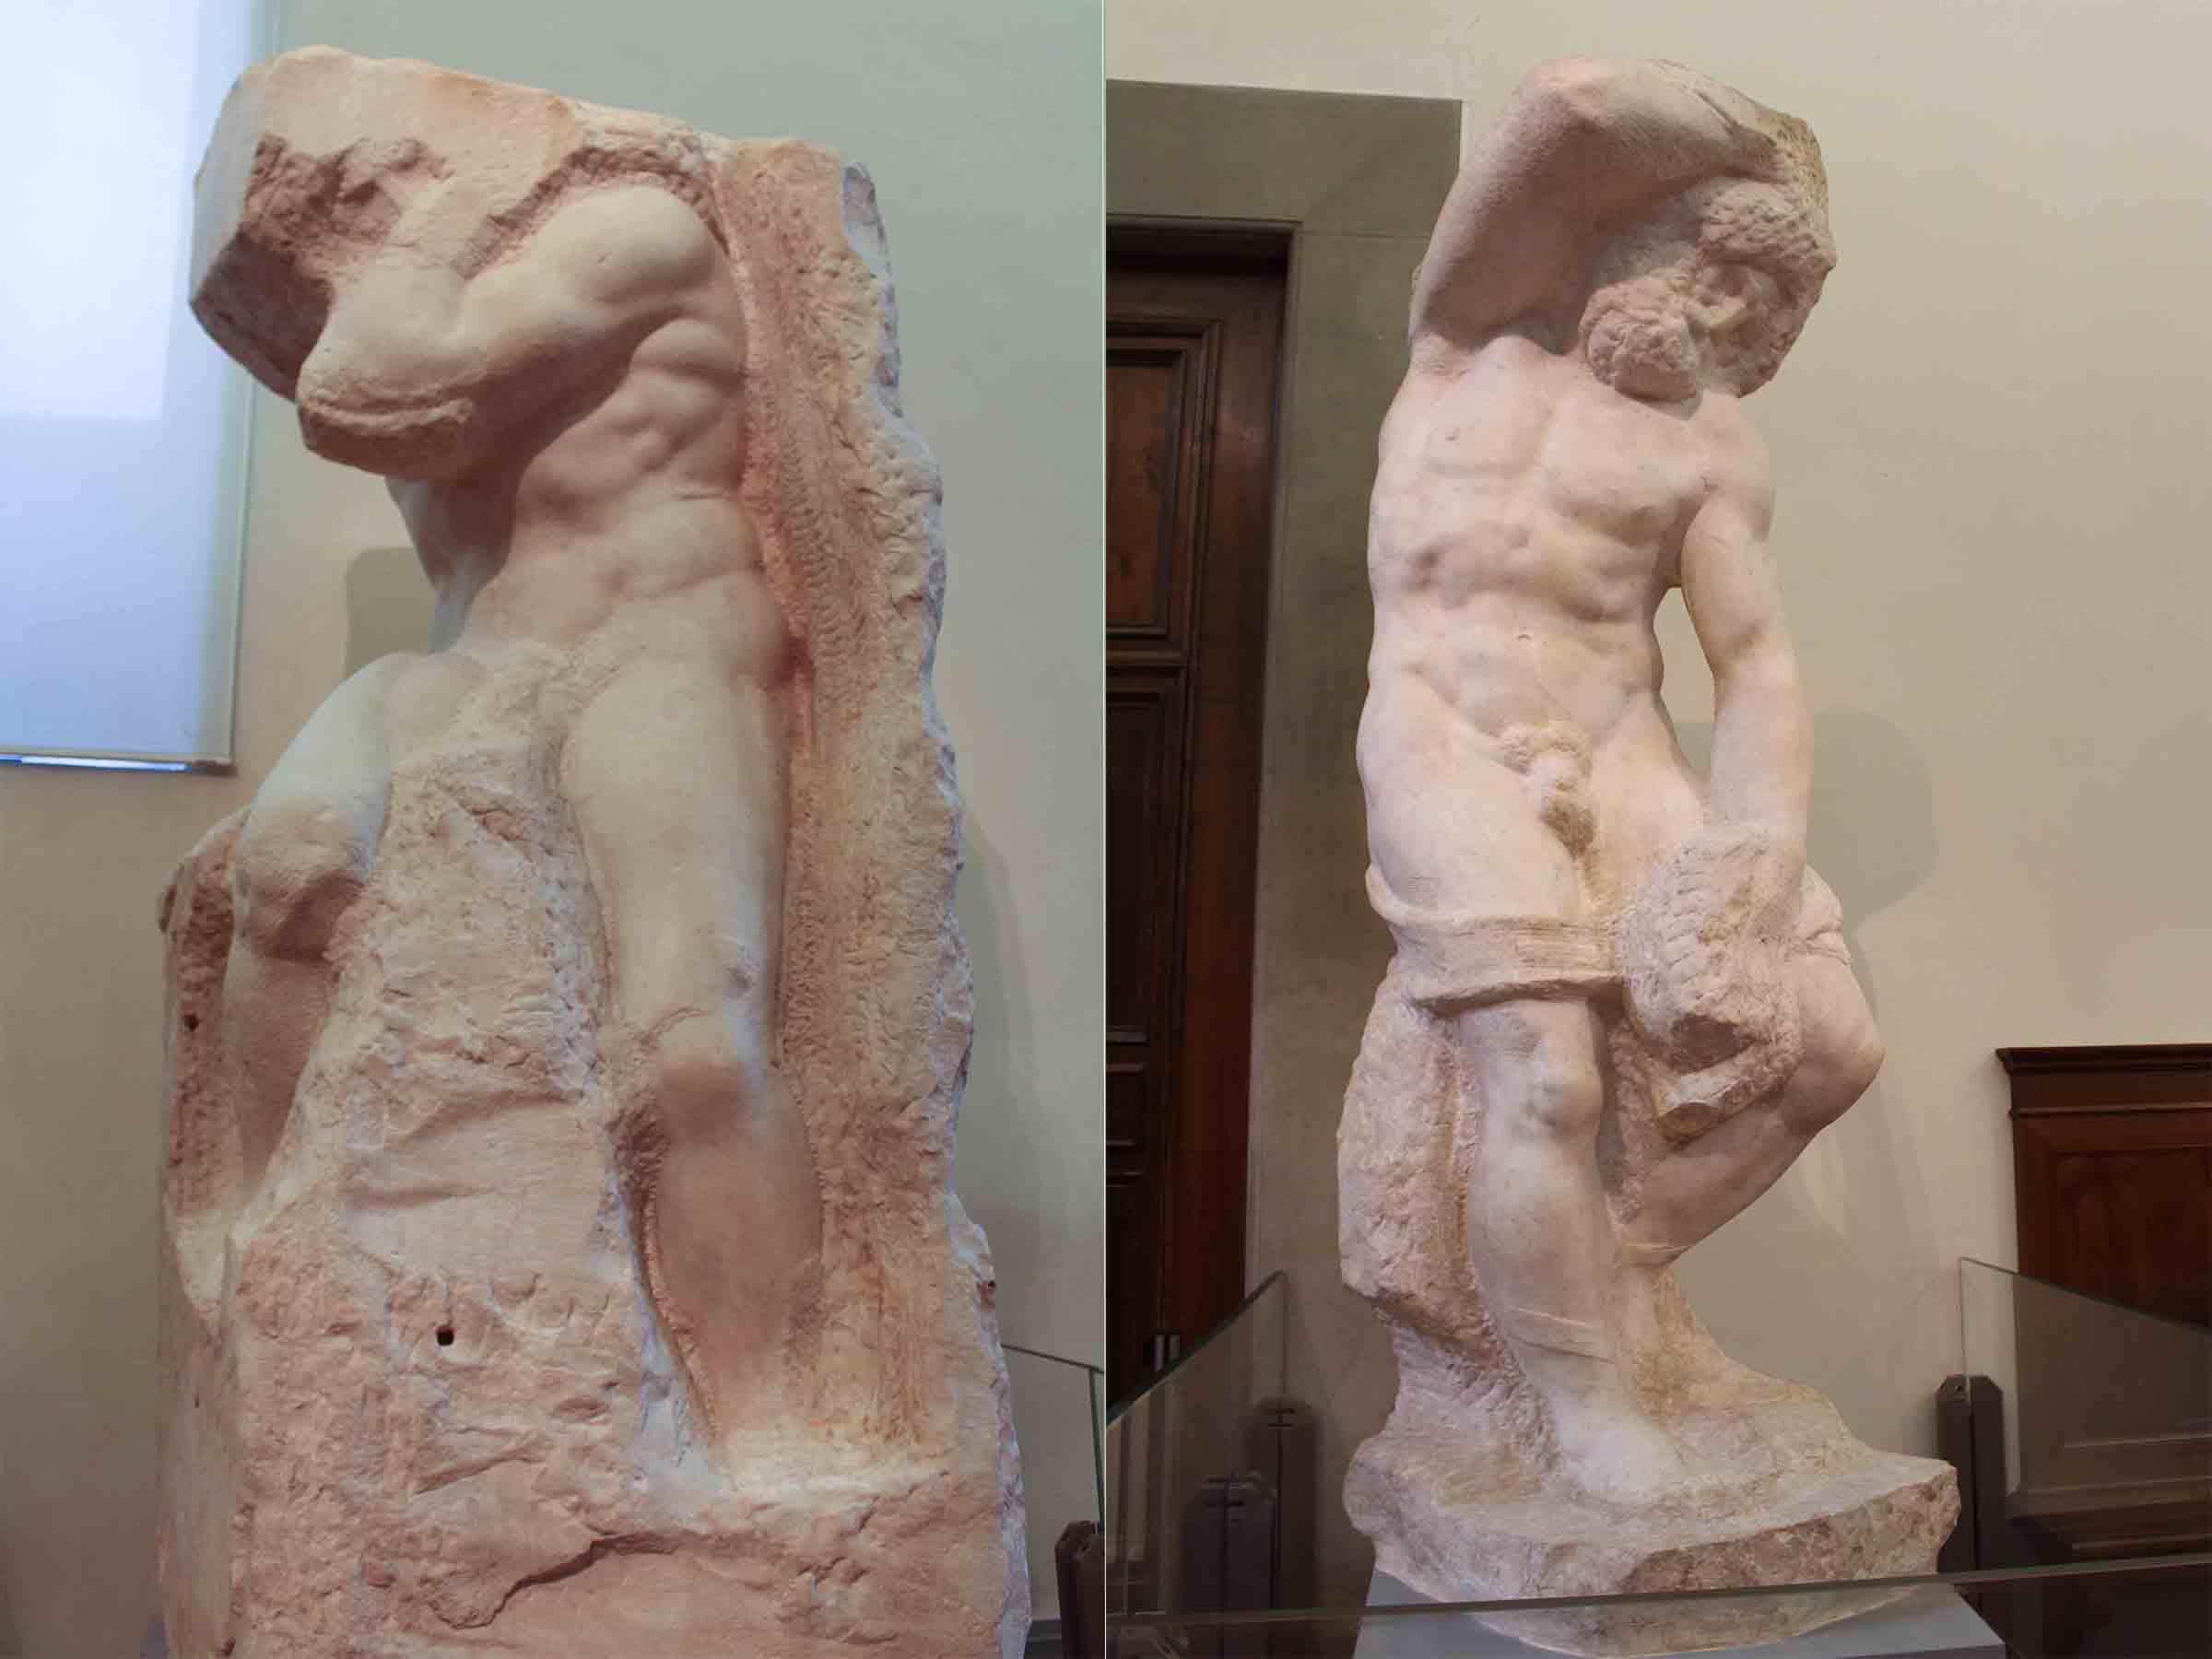 Michelangelo unfinished sculptures